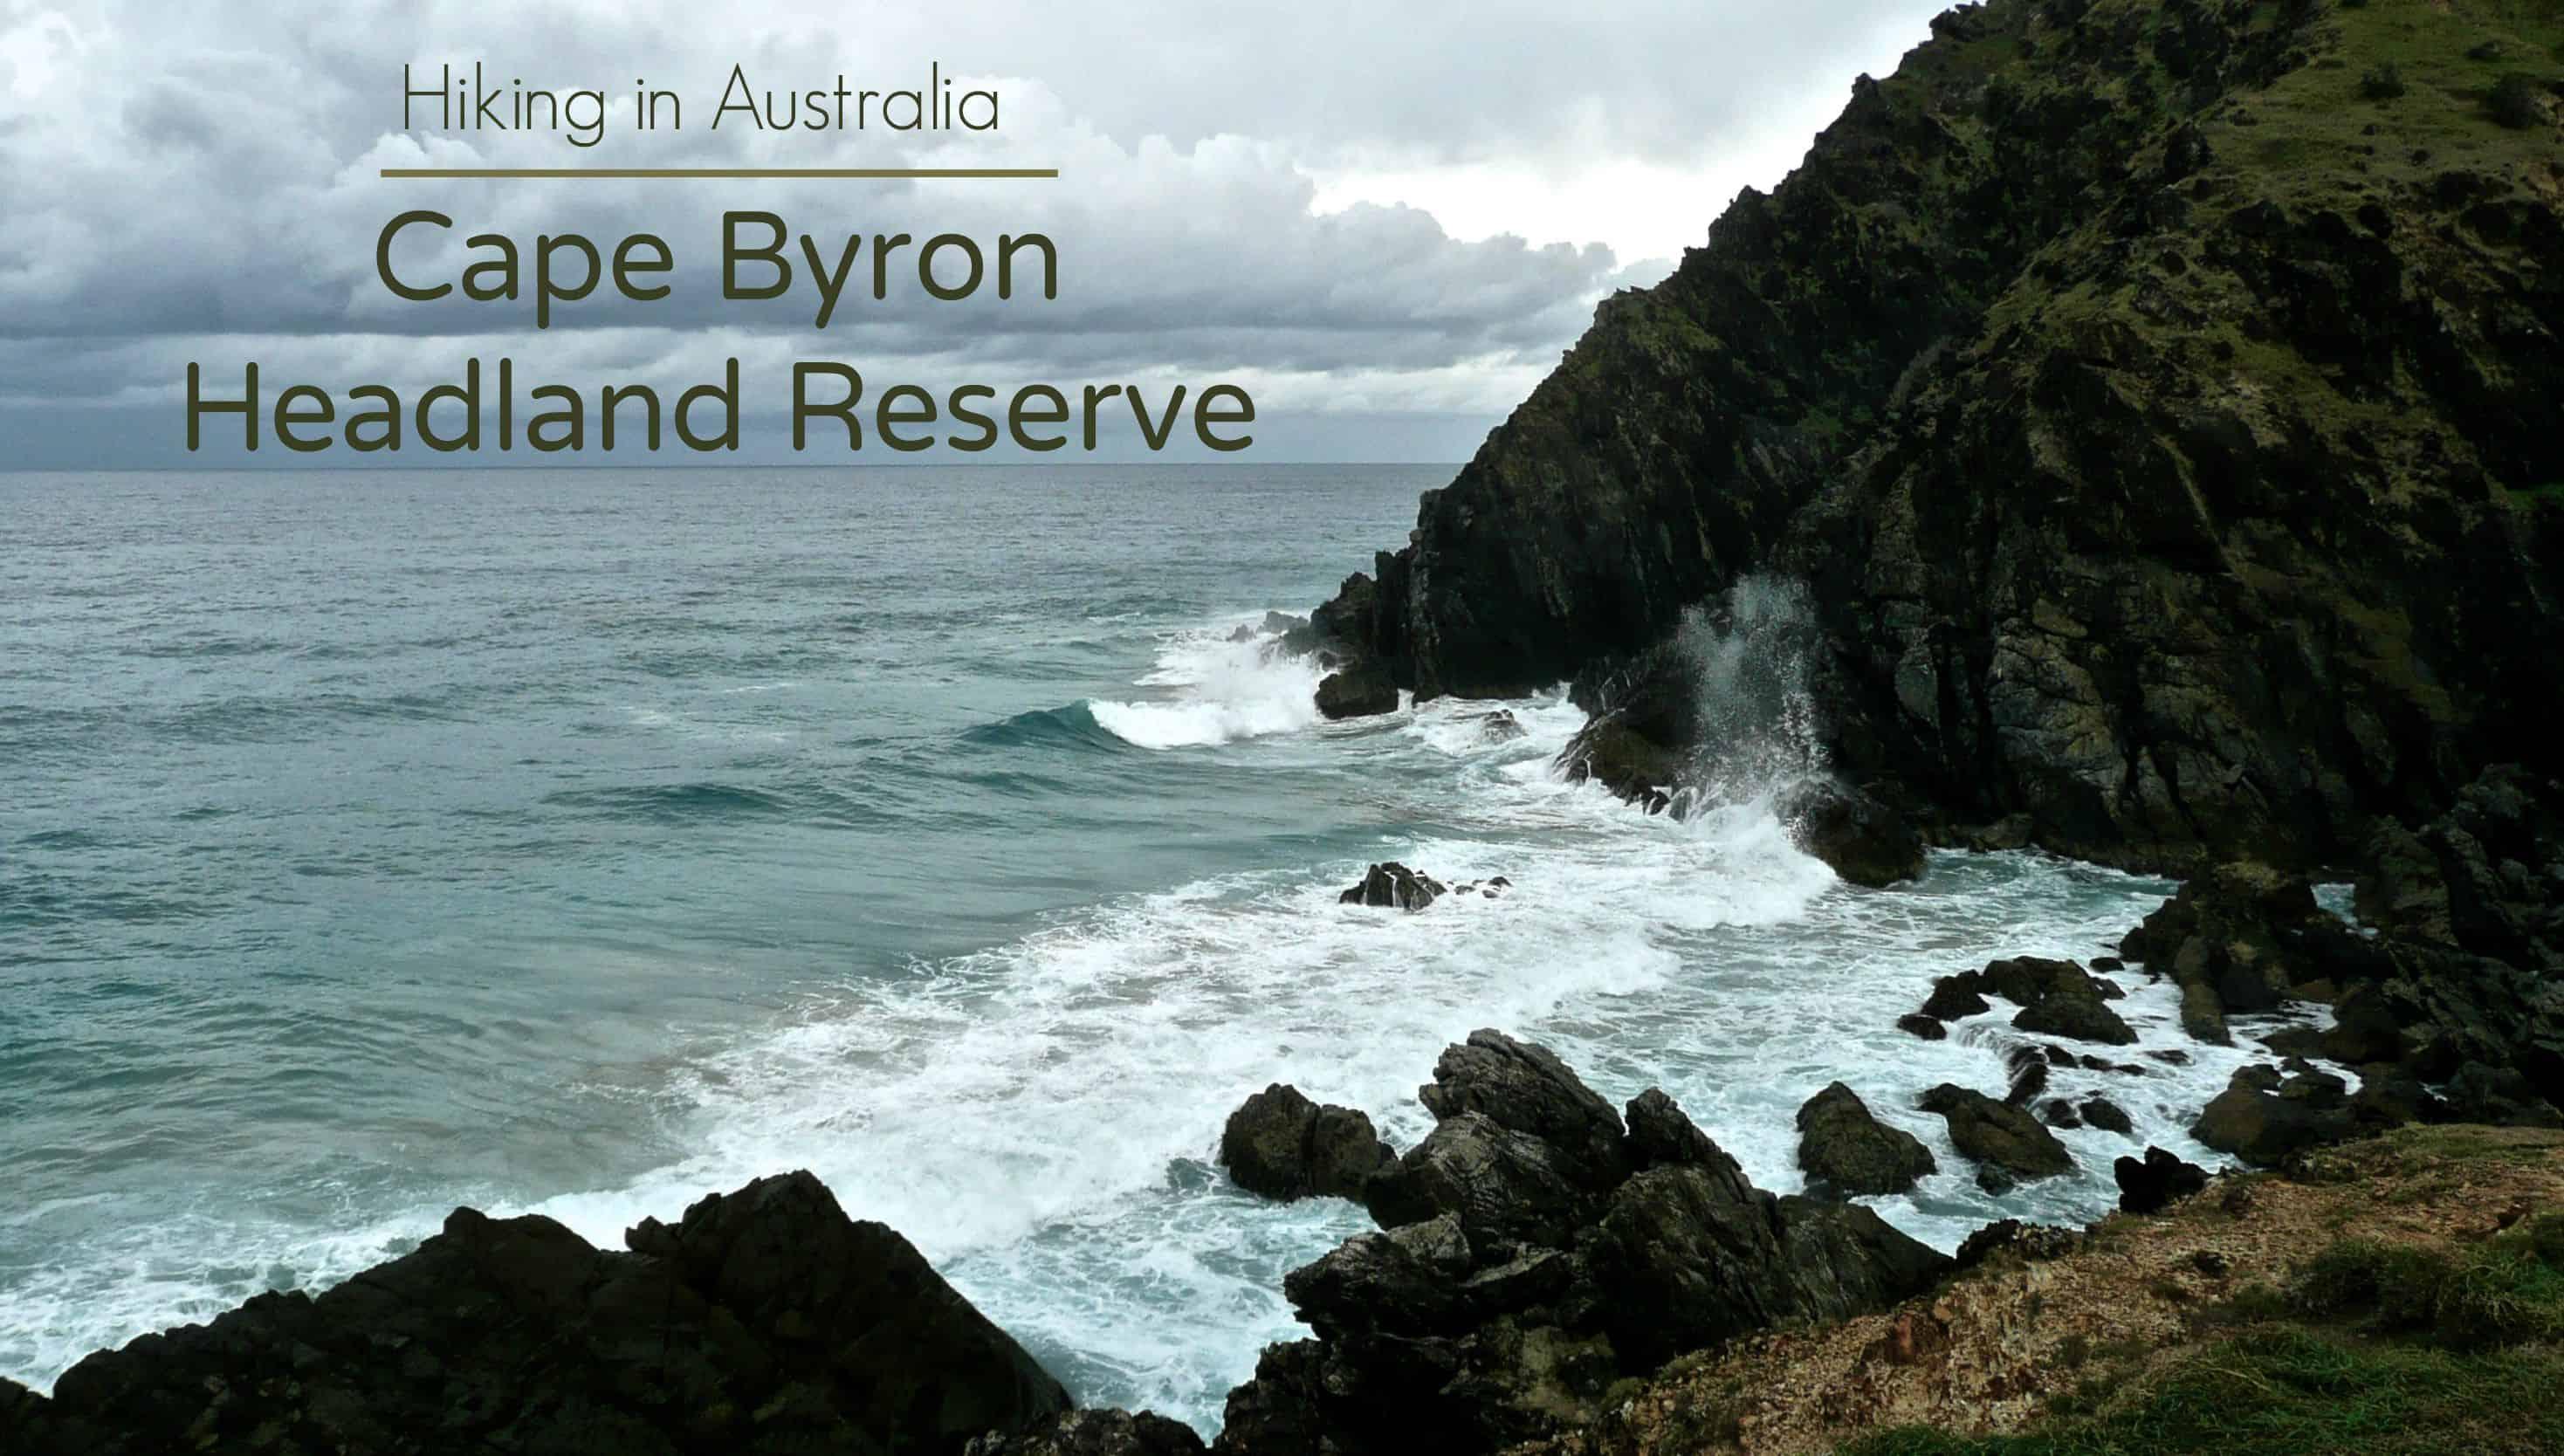 Cape Byron Headland Reserve, Byron Bay, Australia